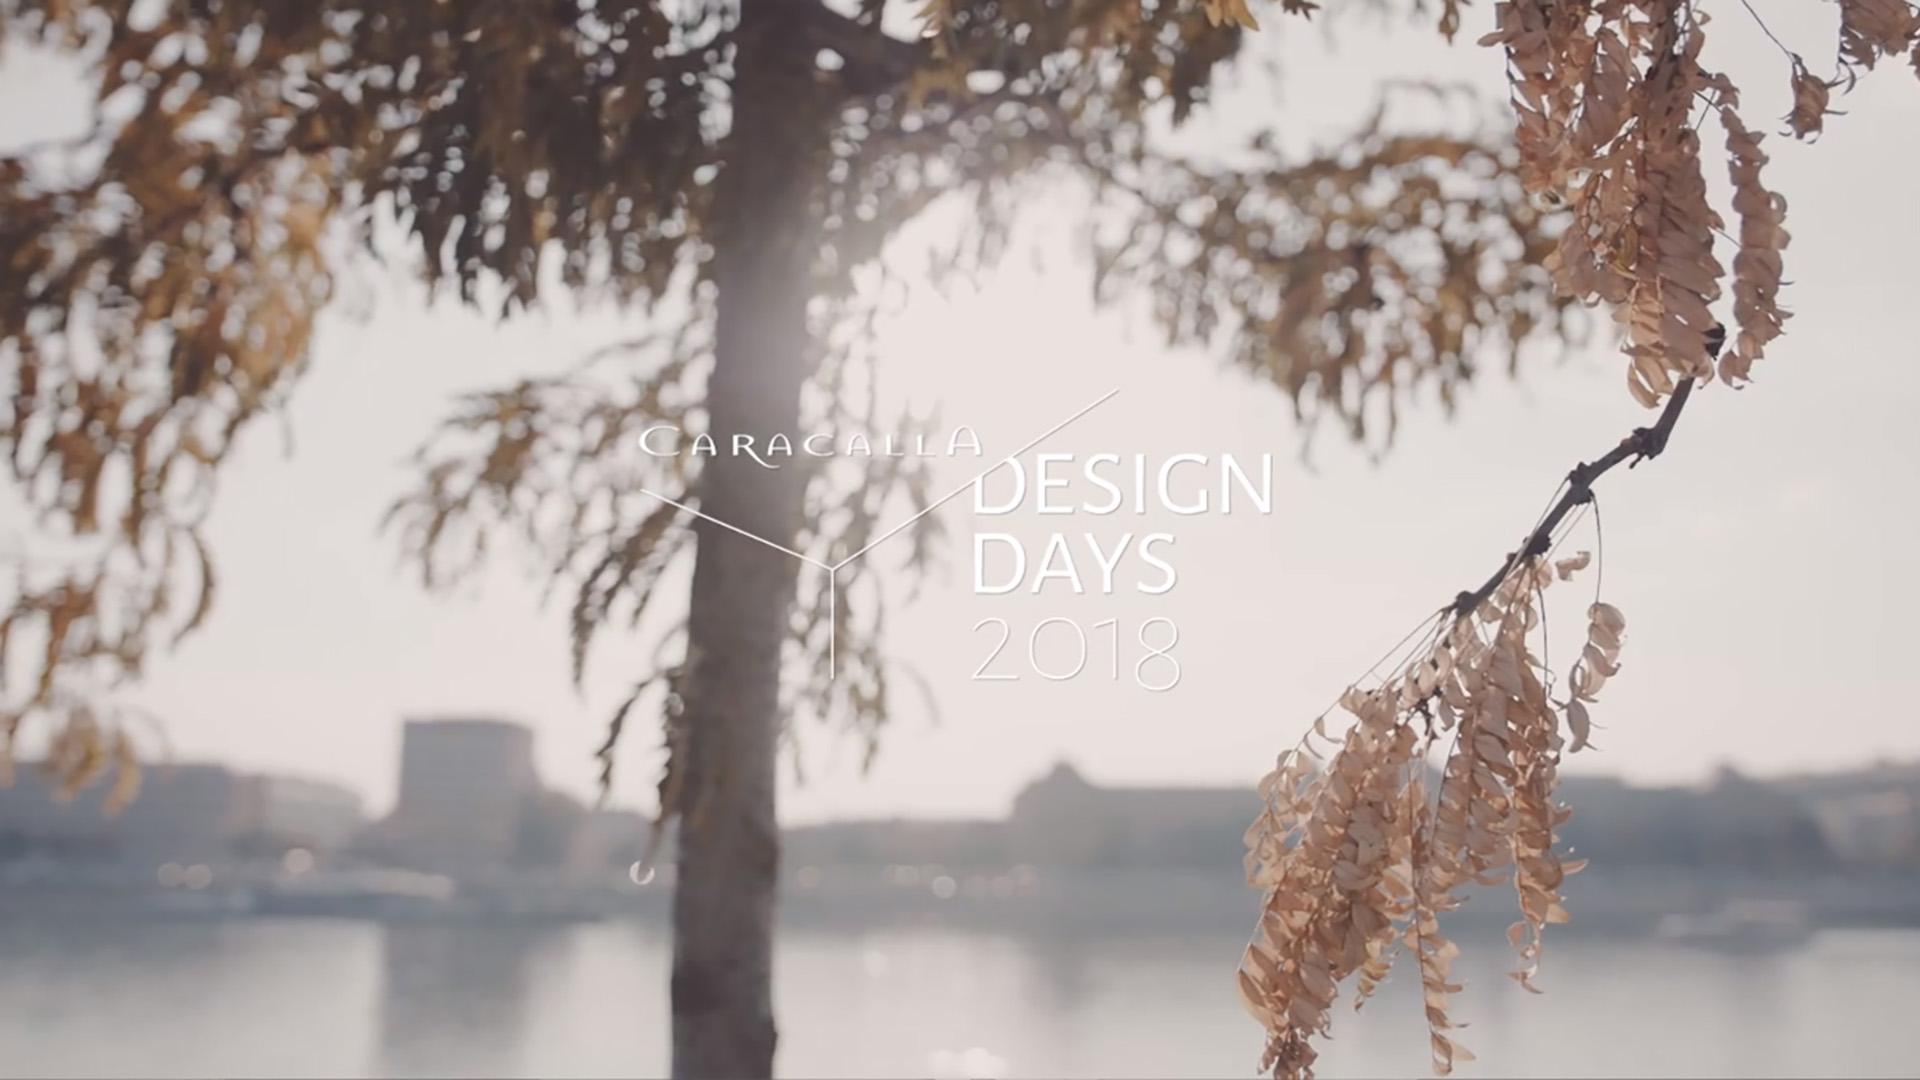 Caracalla Design Days 2018